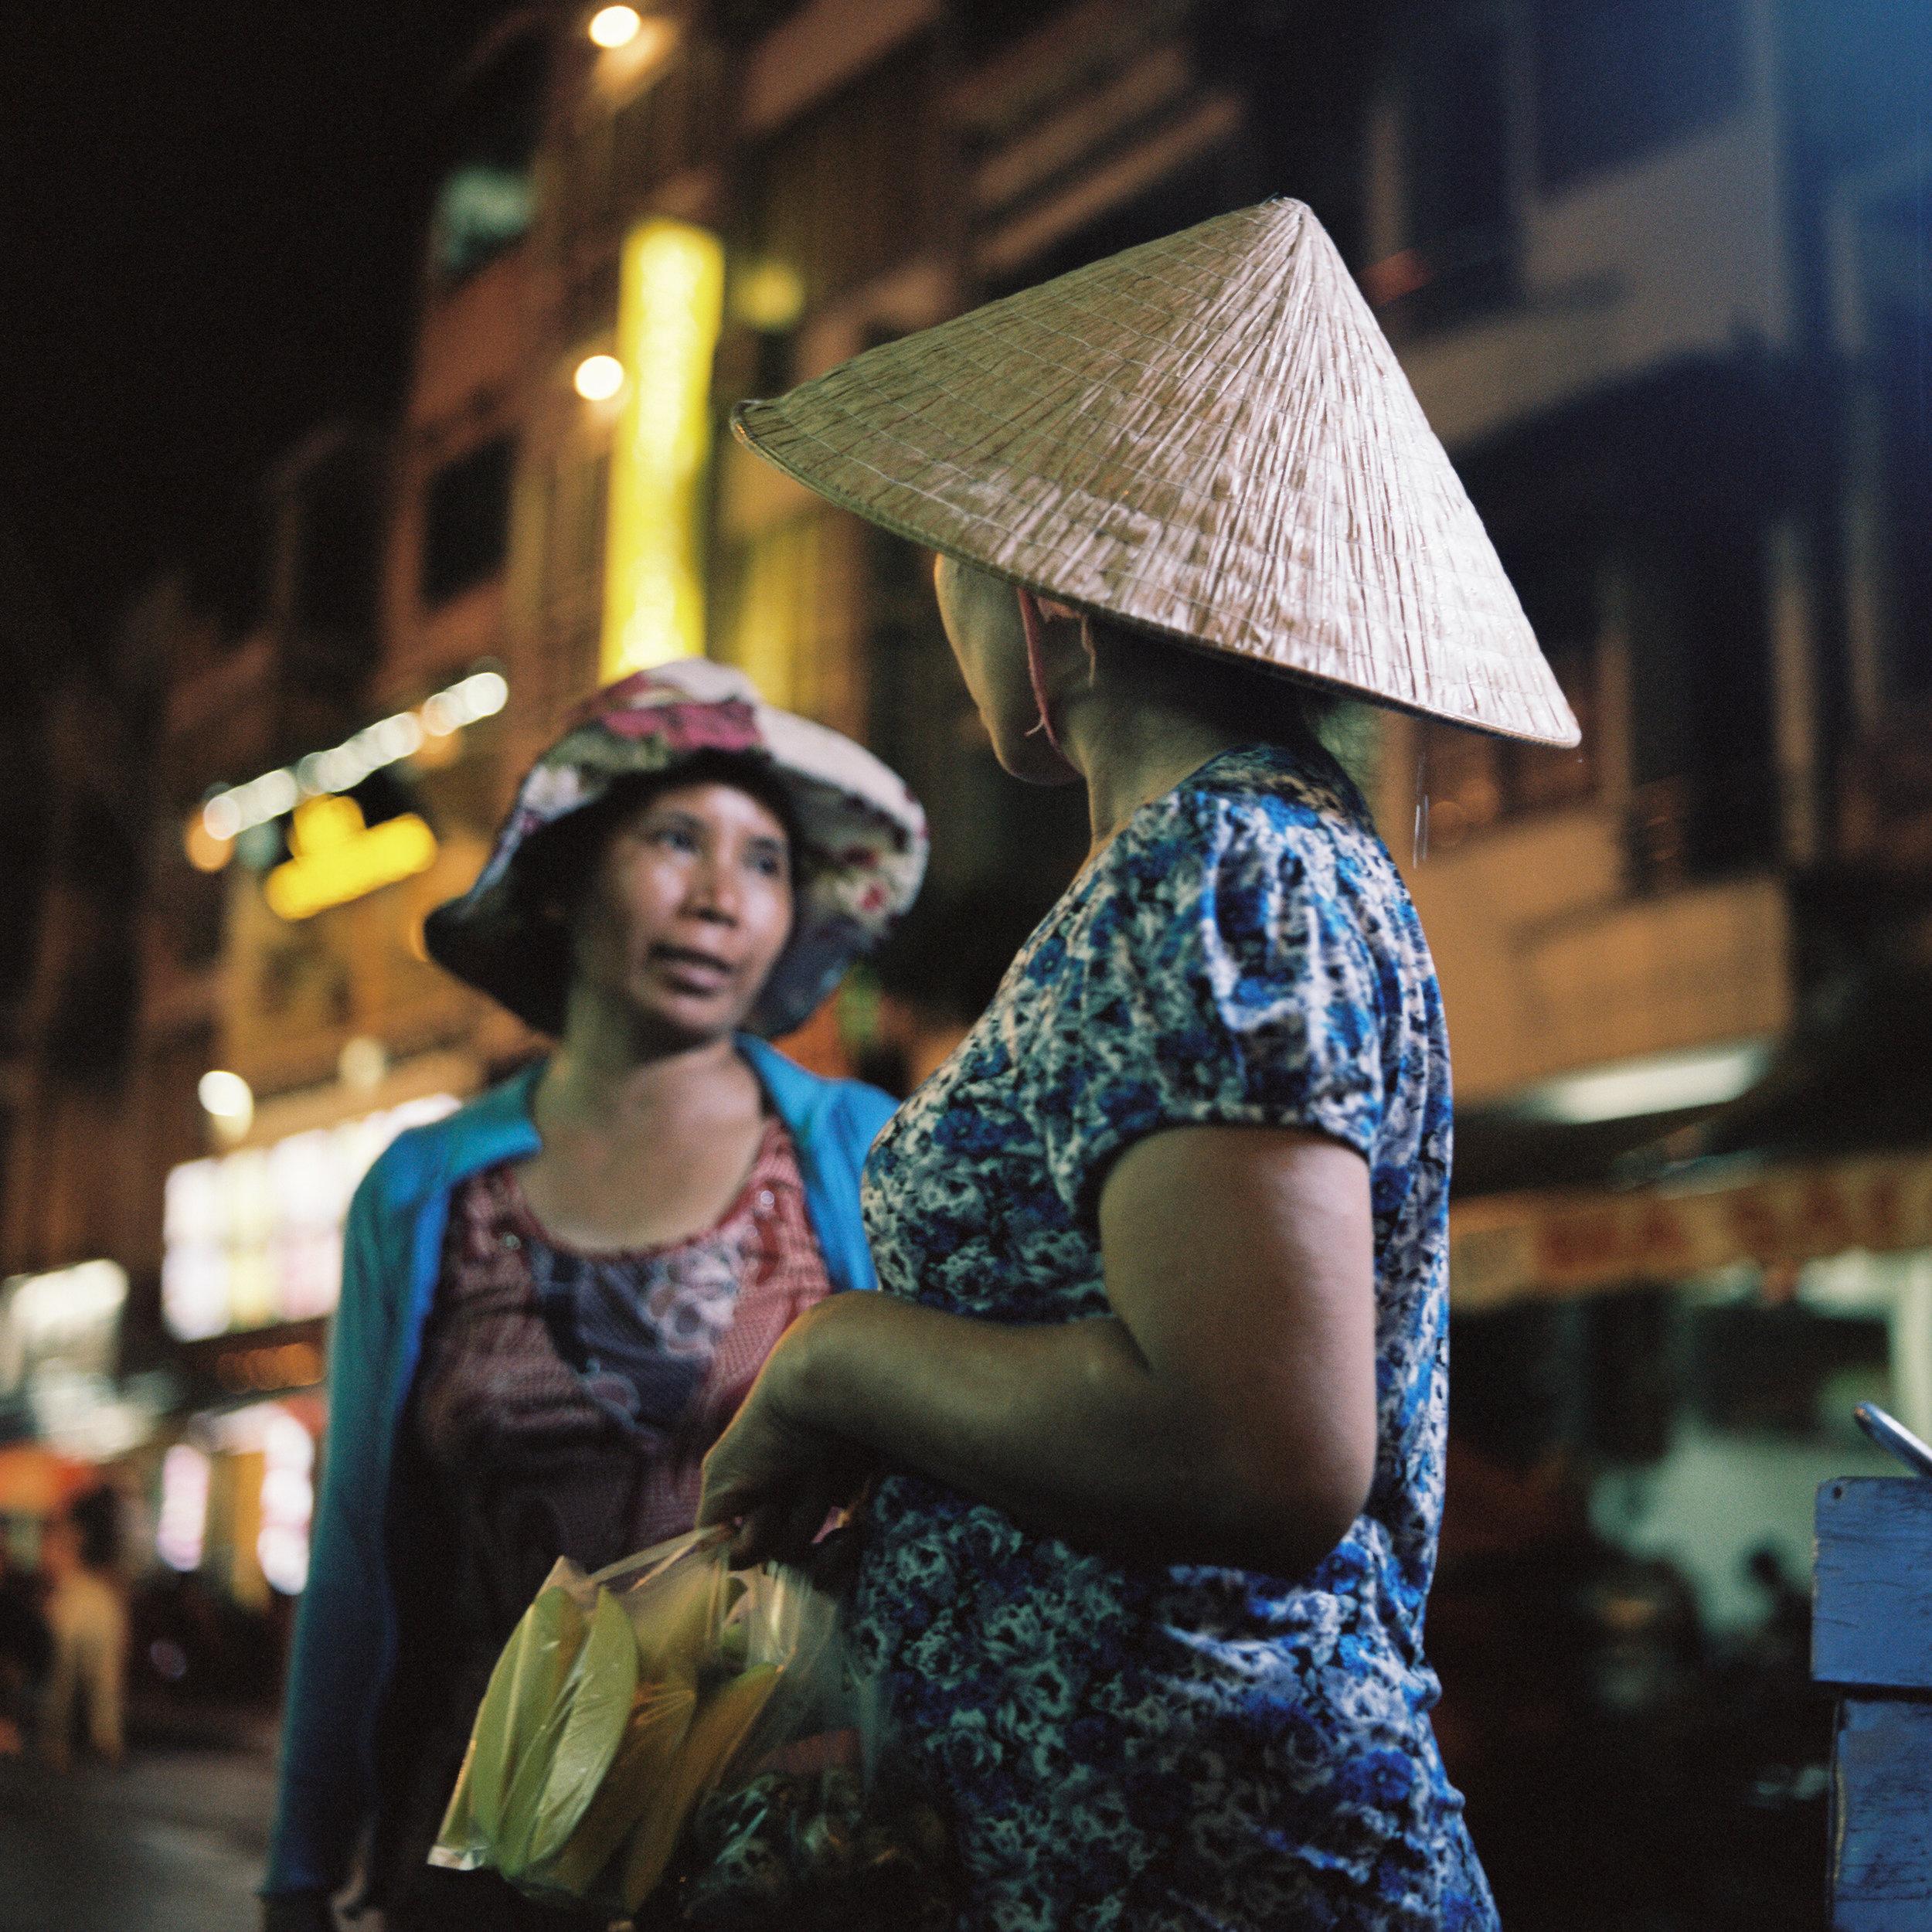 Ho Chi Minh City, Vietnam 2017